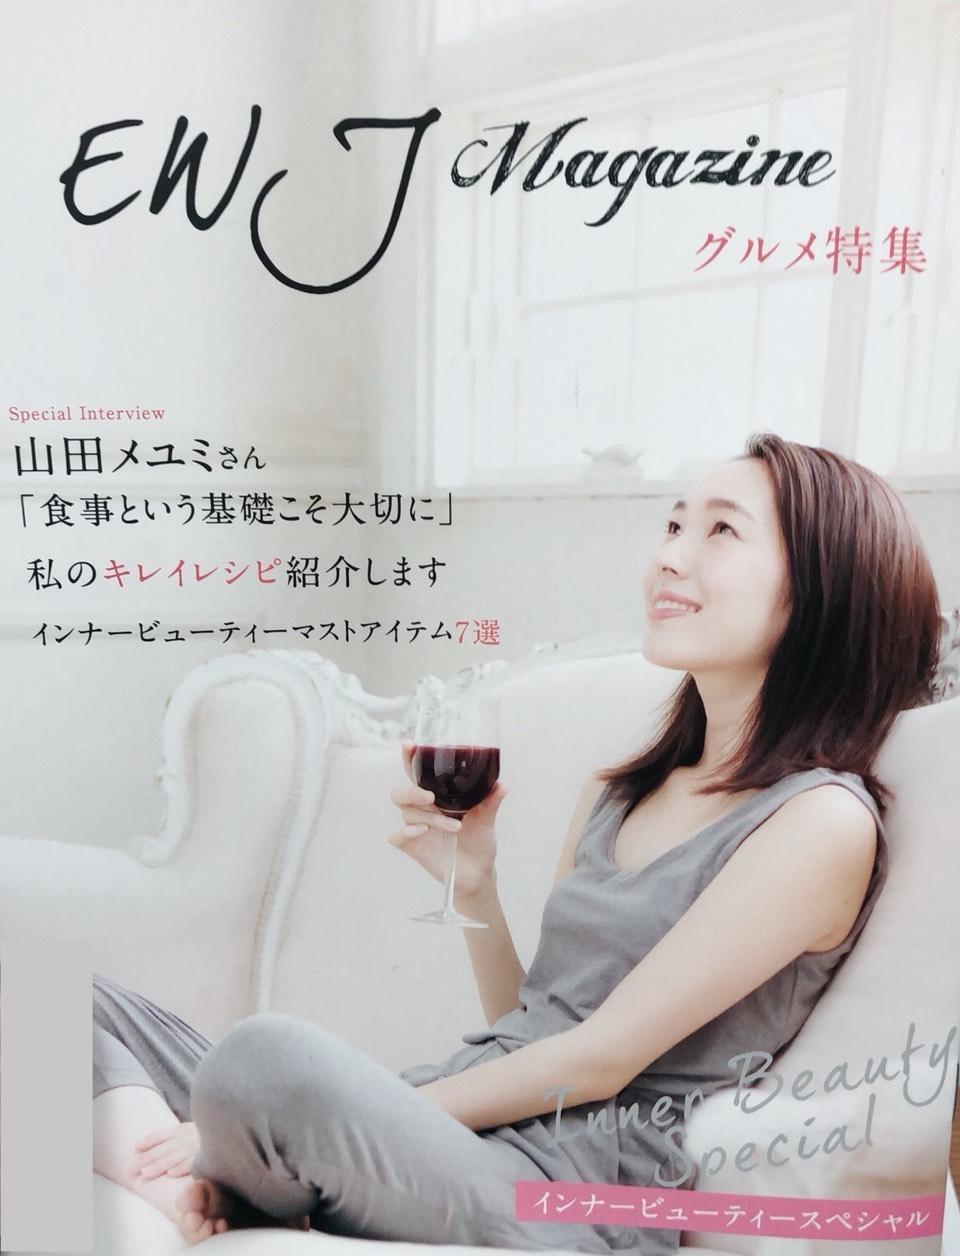 WJ Magazineで童顔シリーズが取り上げあらました!